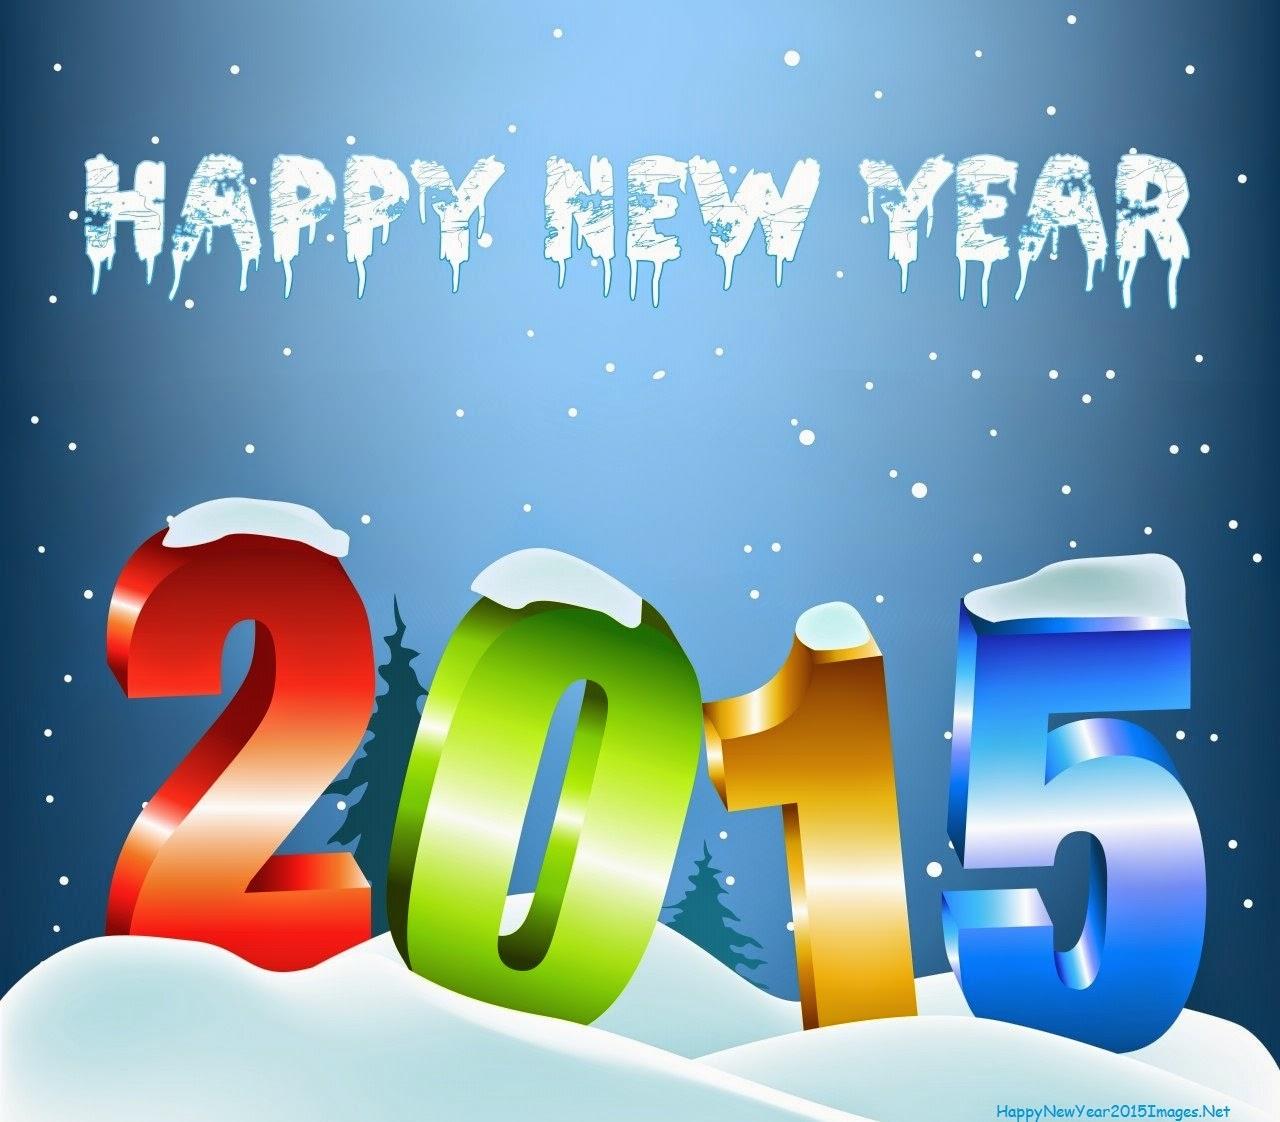 Latest 3D Happy New Year wallpaper 2015 Scoopak 1280x1122